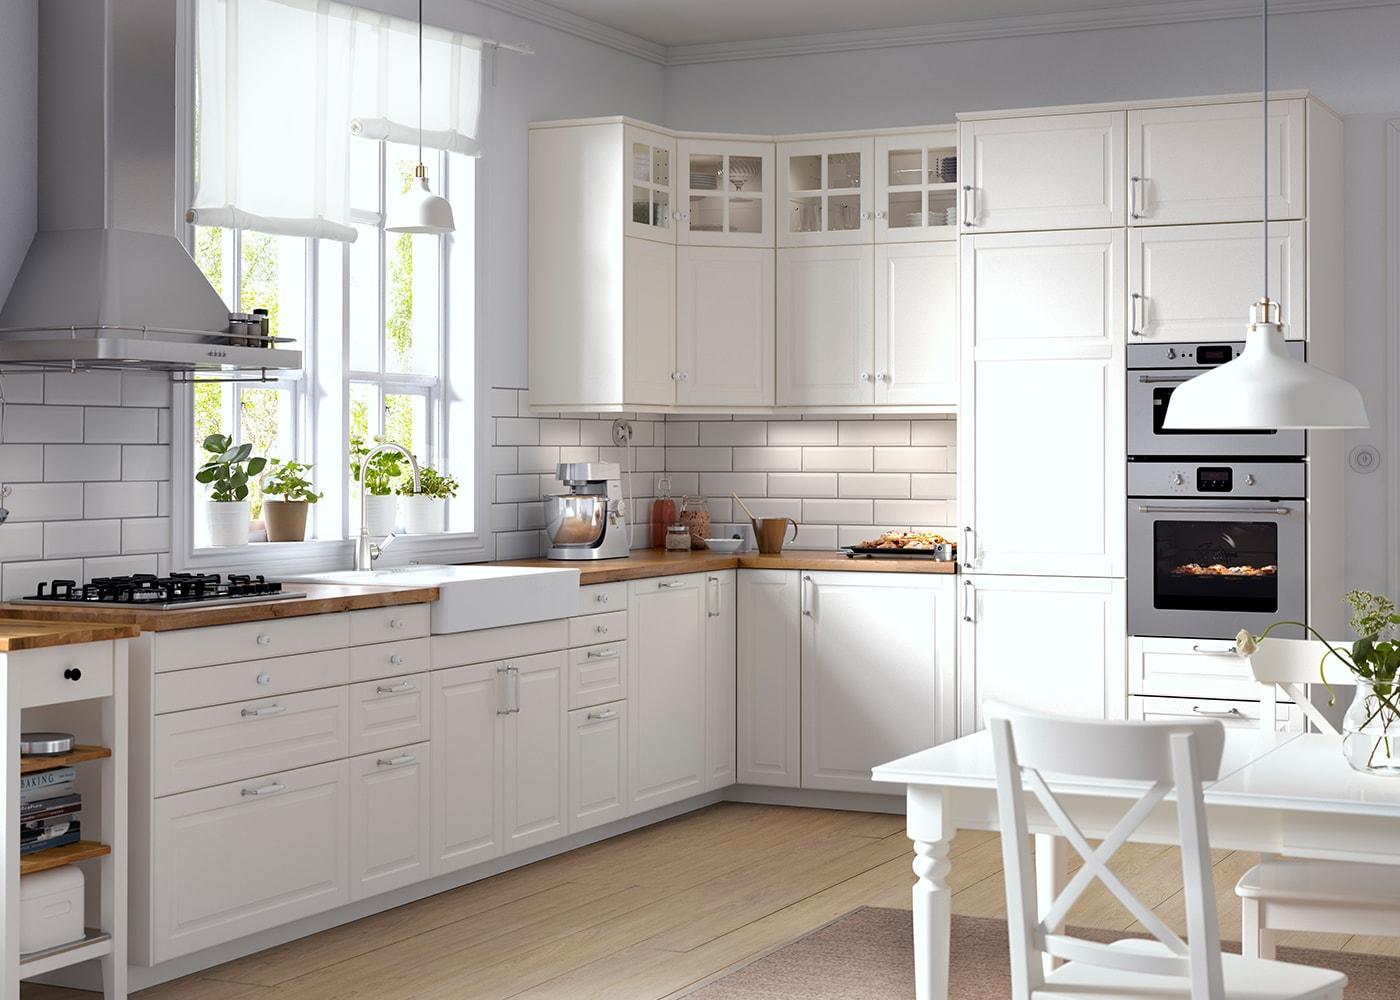 Wohnküche Ideen Ikea